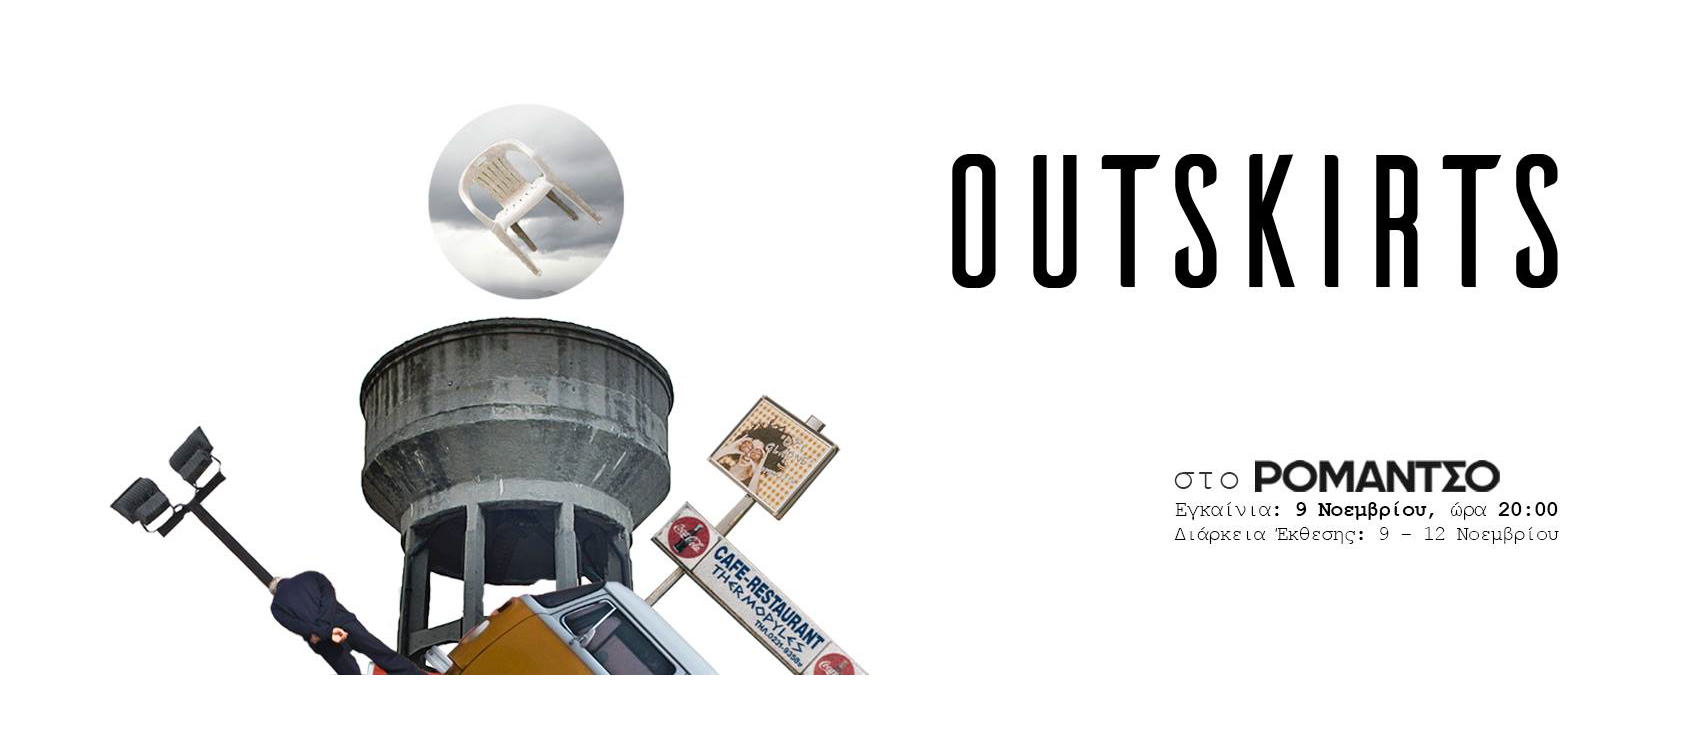 """Outskirts"": Τα όρια της πόλης σε μια ομαδική έκθεση φωτογραφίας | ΡΟΜΑΝΤΣΟ"